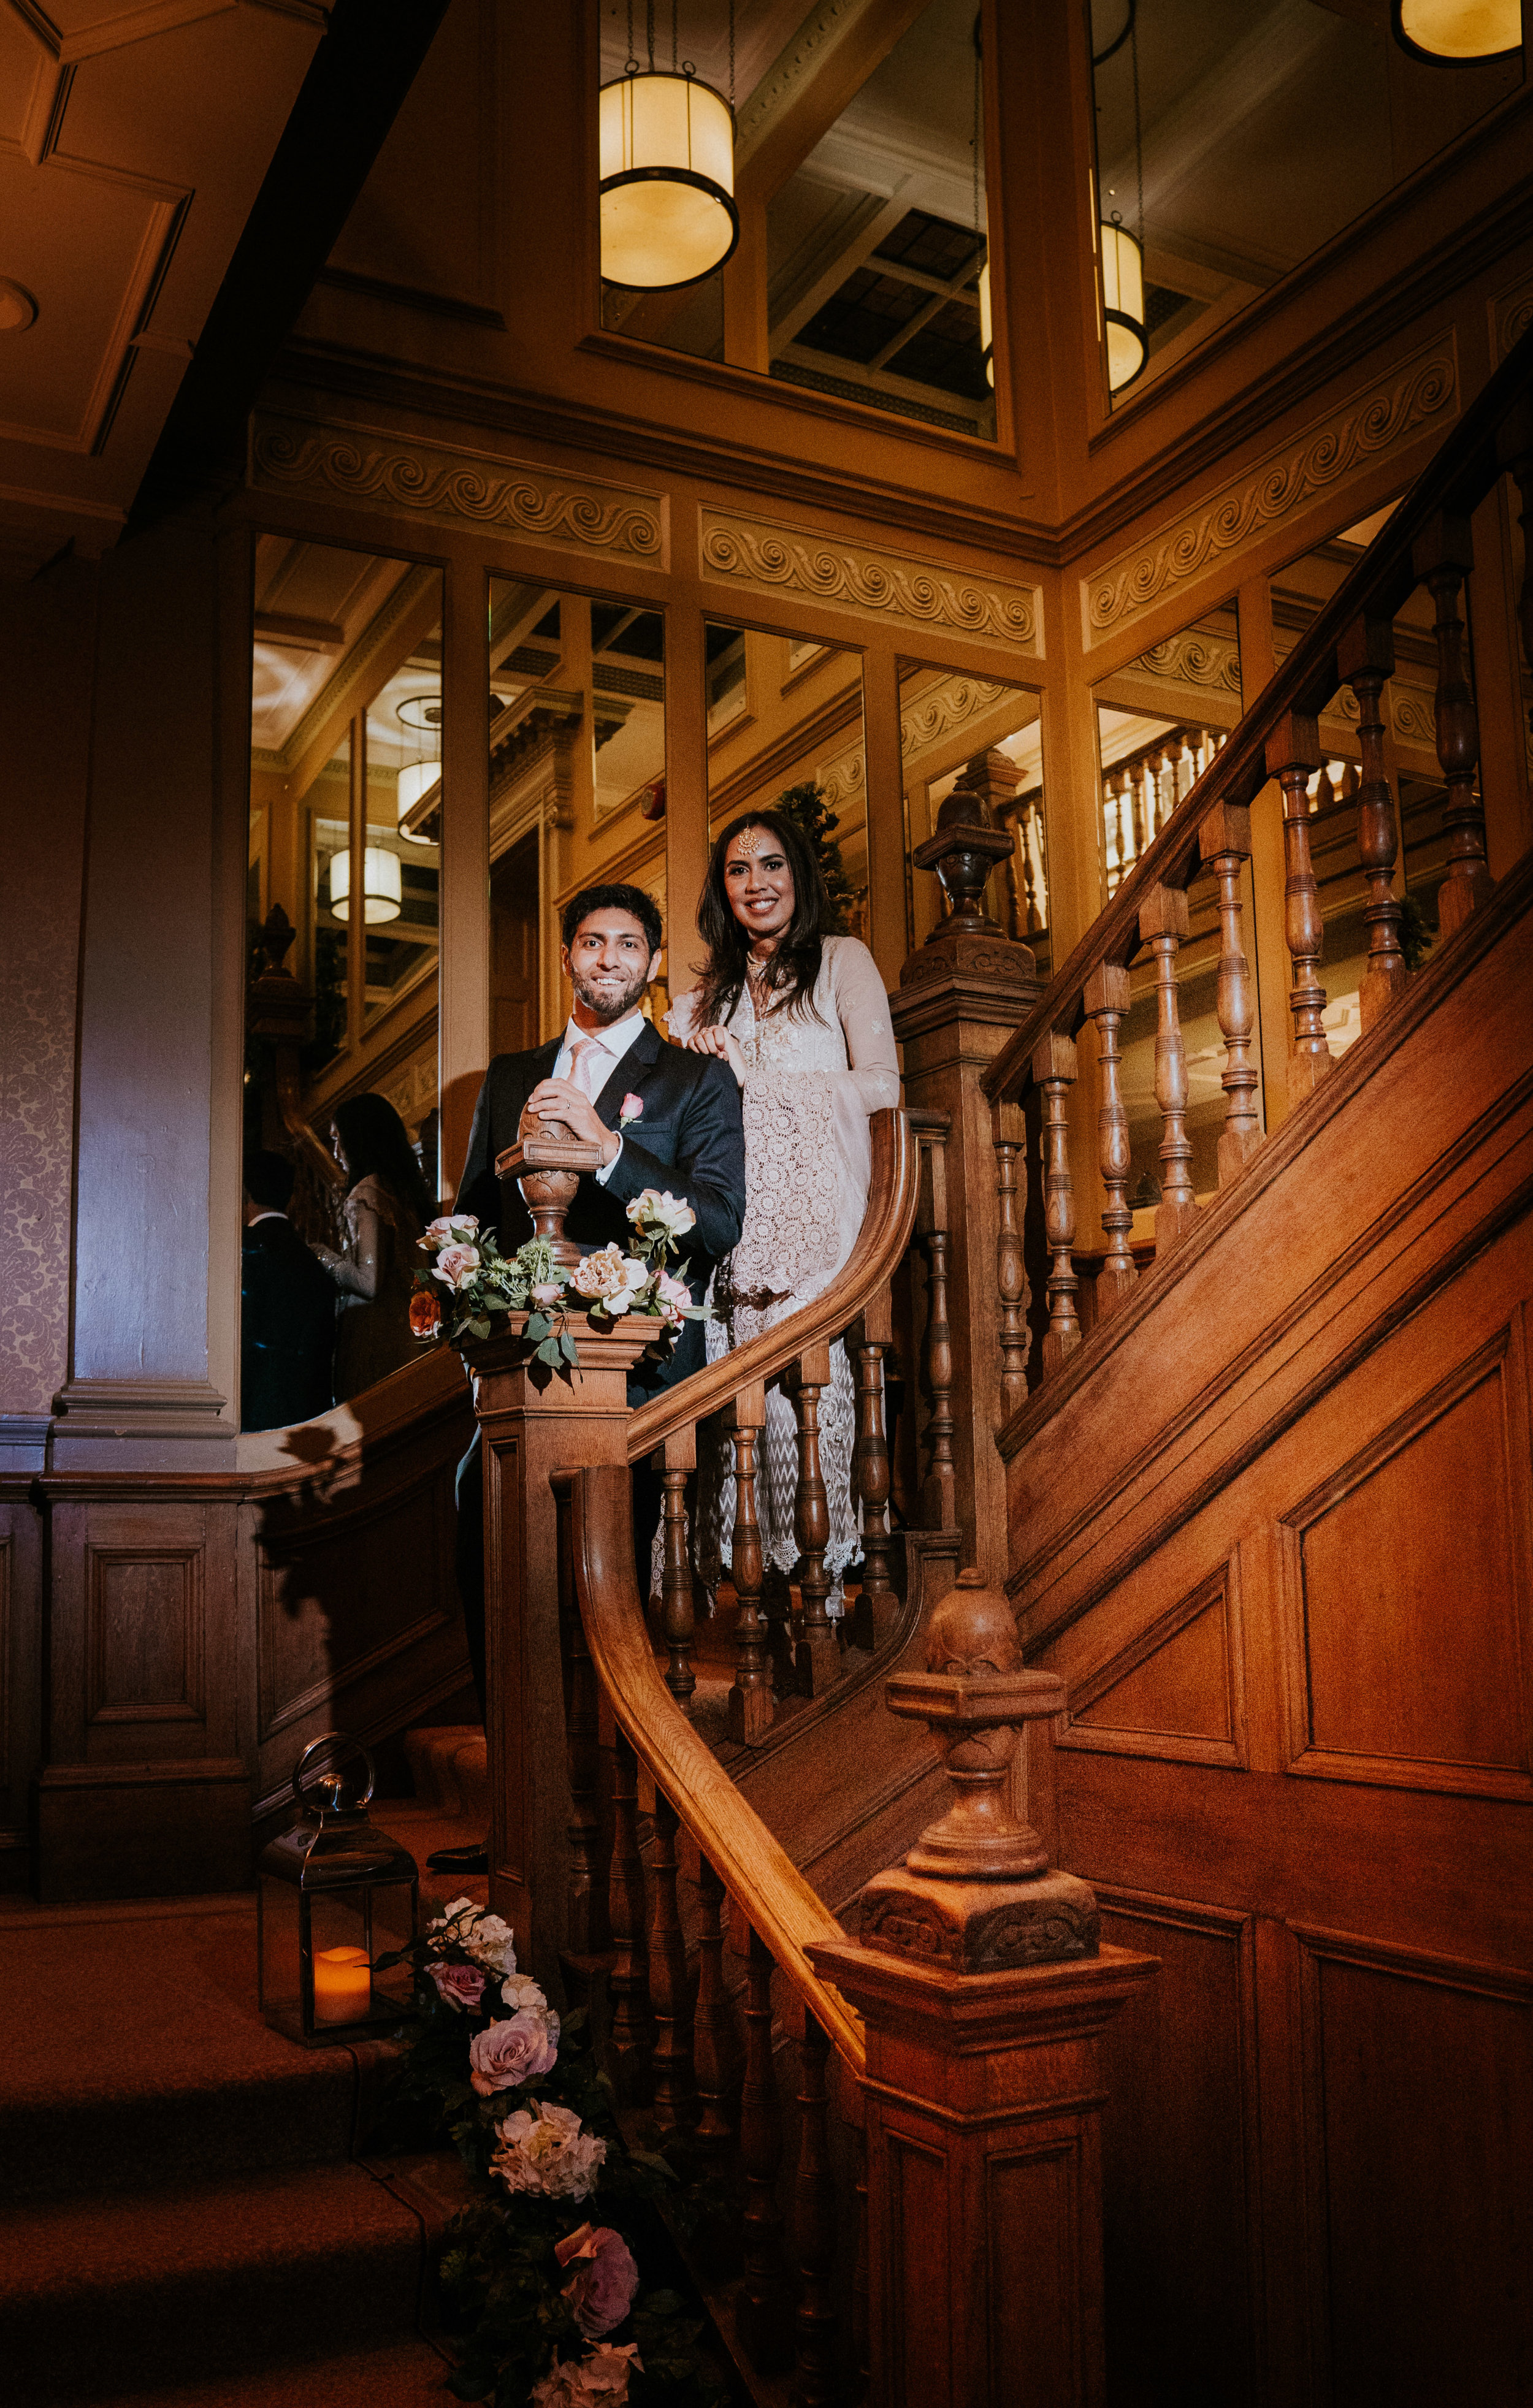 buckinghamshire-golf-club-winter-muslim-wedding-engagement-photography-videography-69